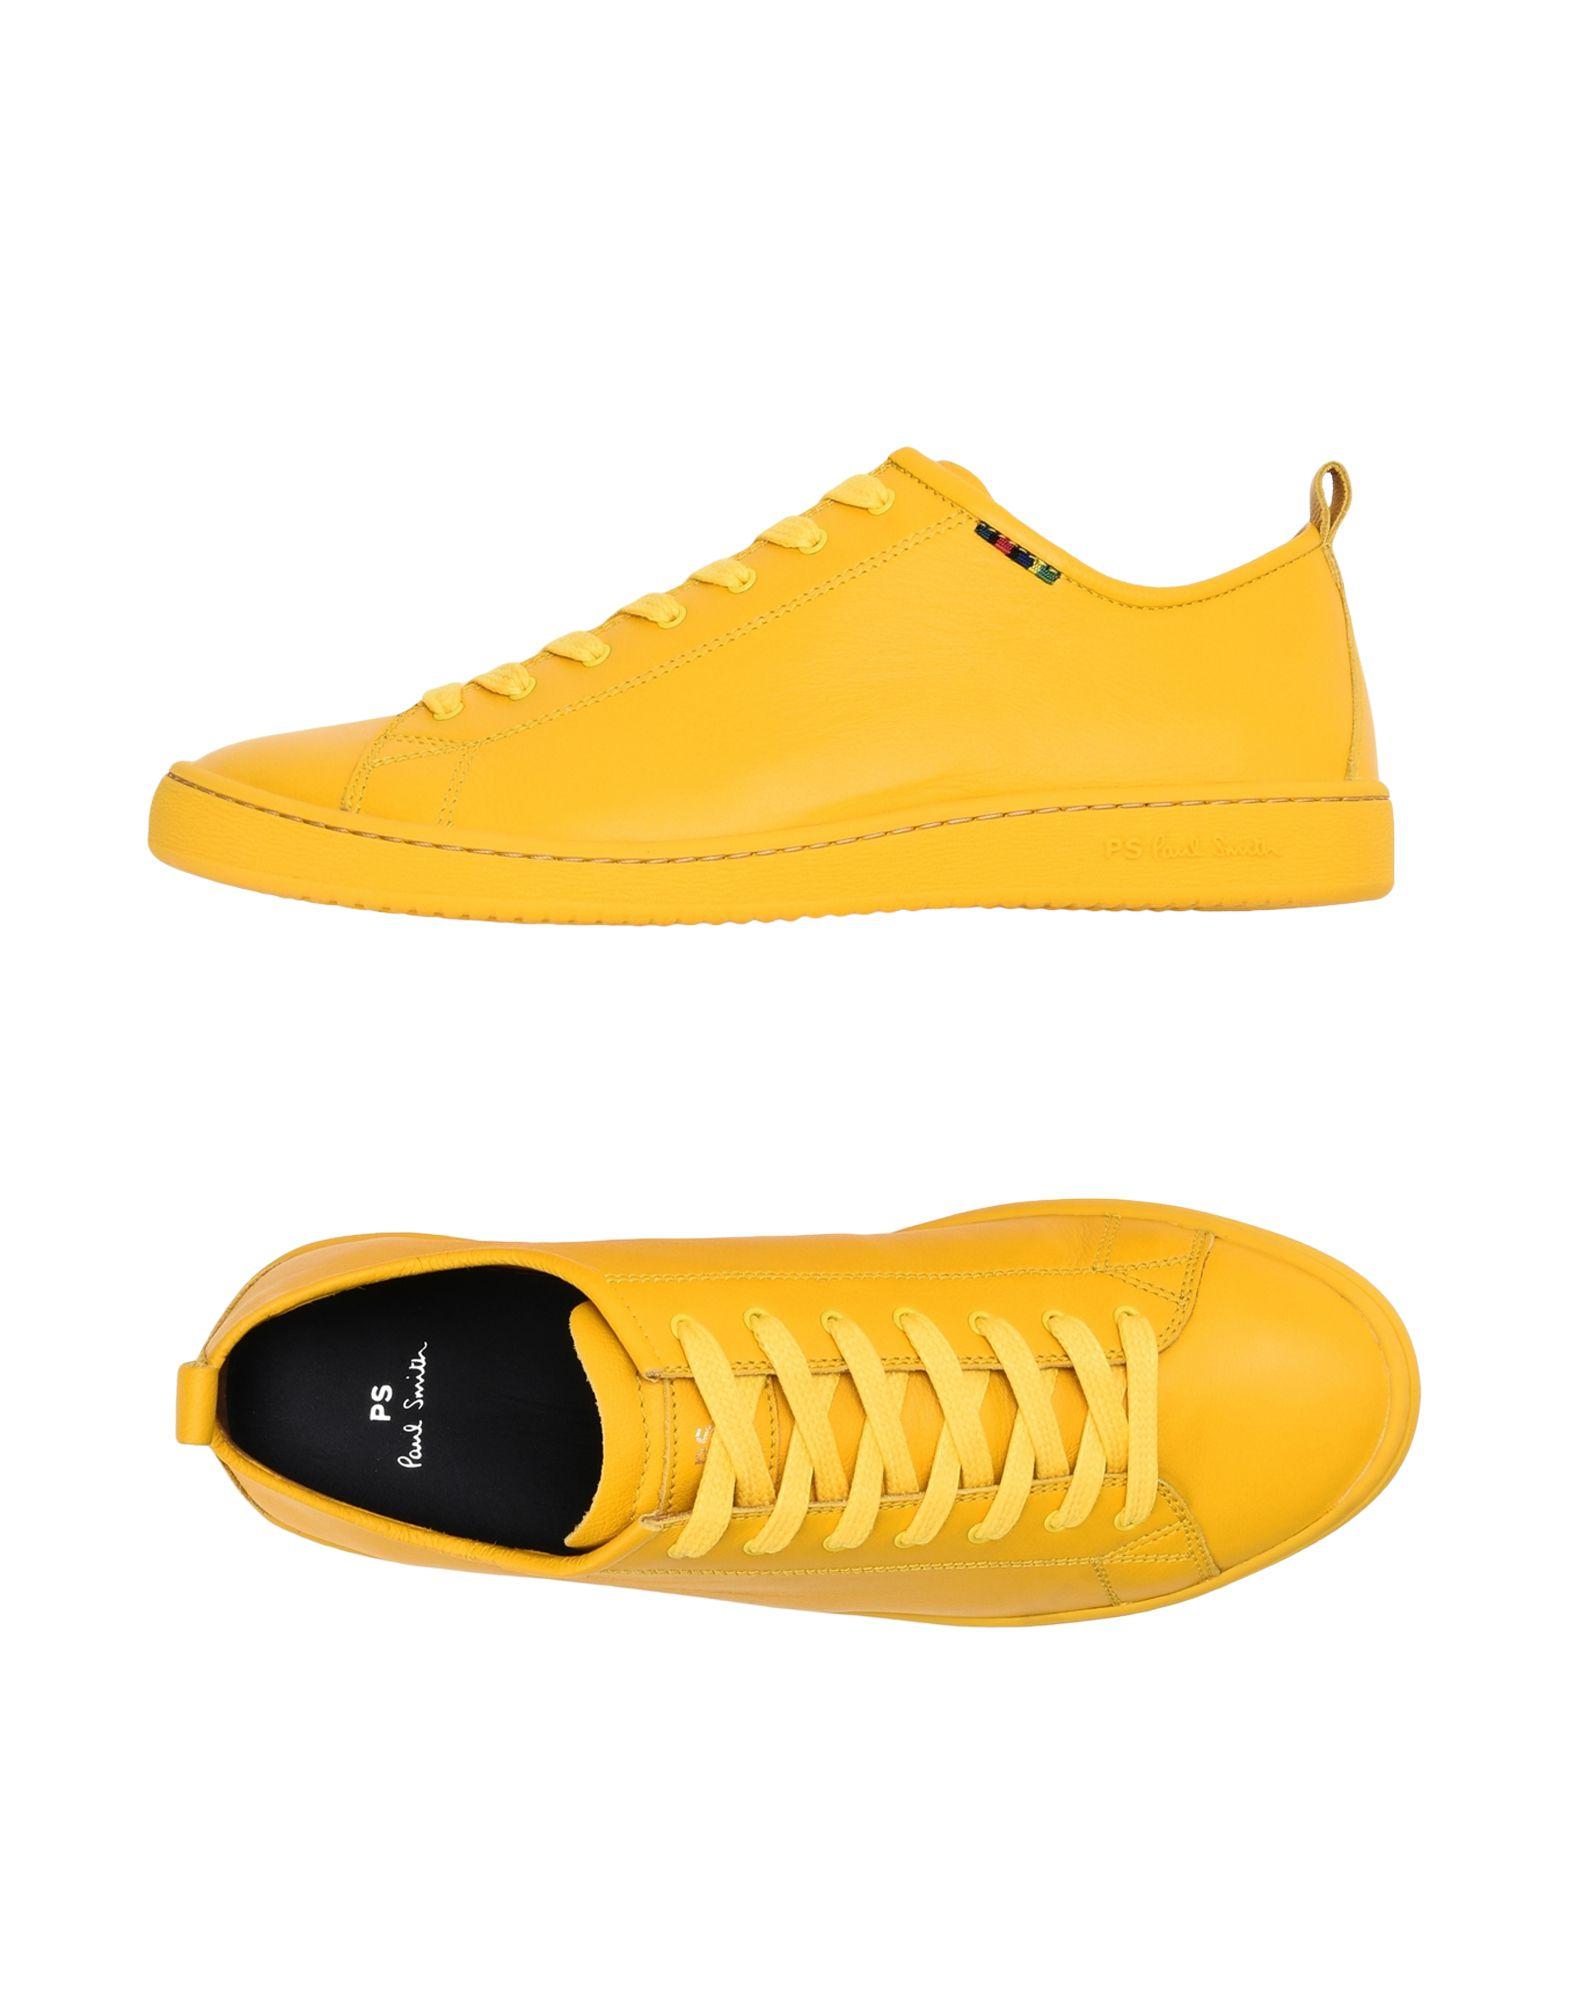 Sneakers Ps By Paul Smith Mens Shoe Miyata Lemon Yellow - Uomo - Acquista online su